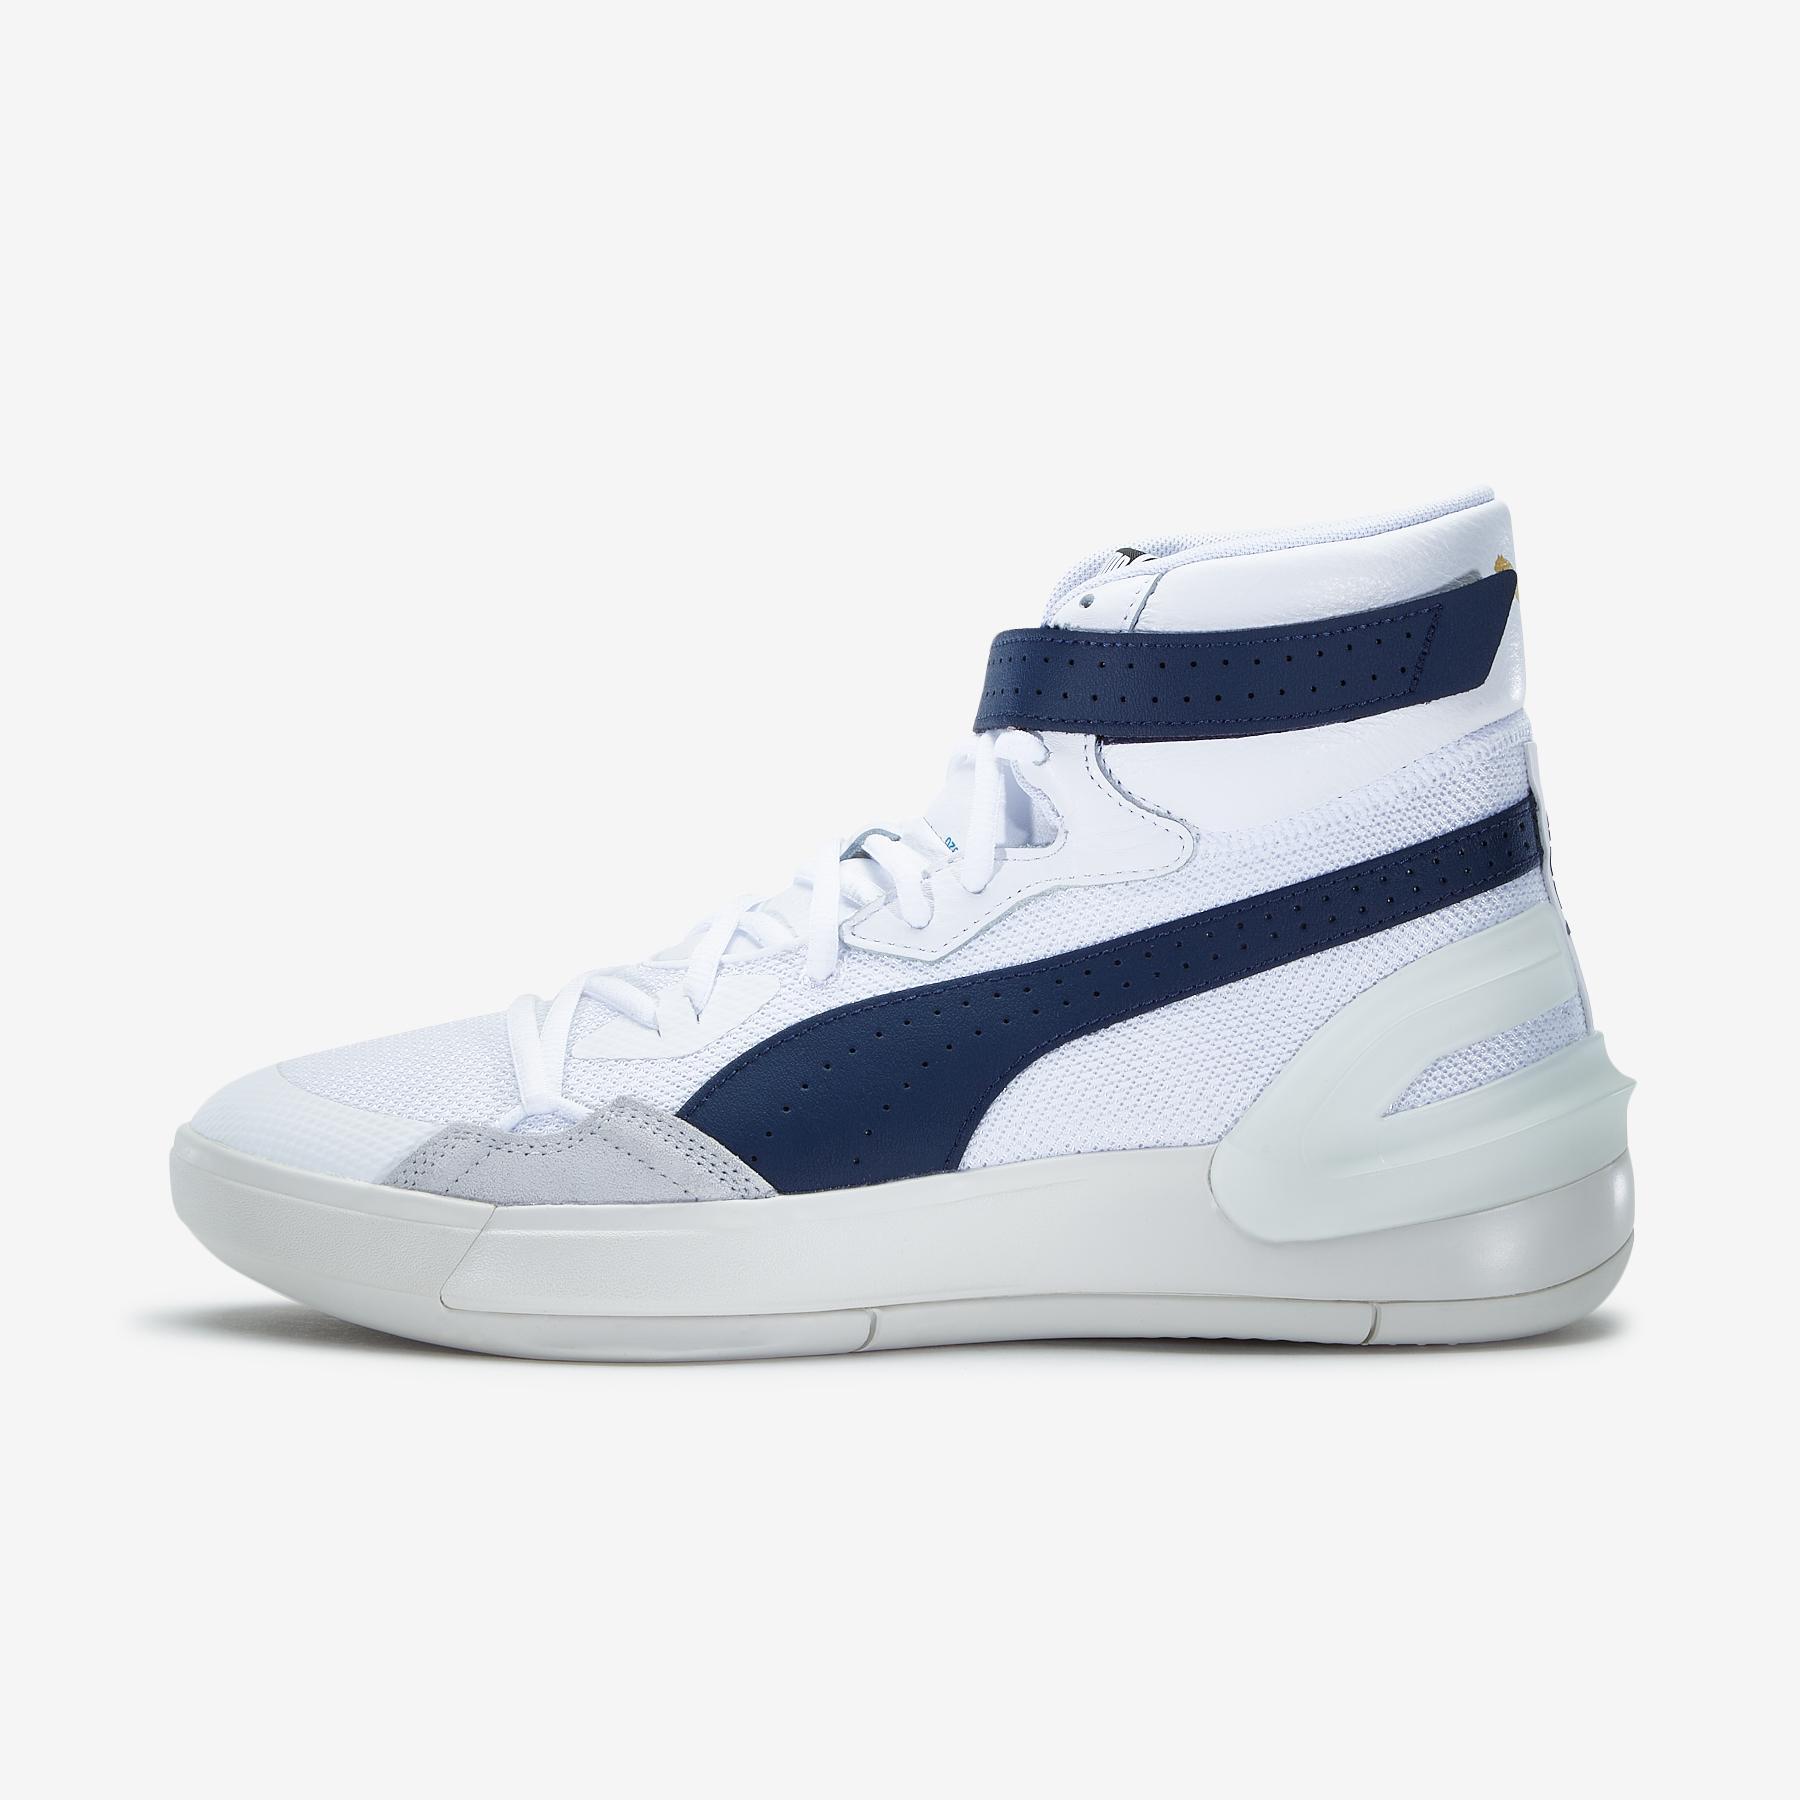 Men's Sky Modern Basketball Shoes